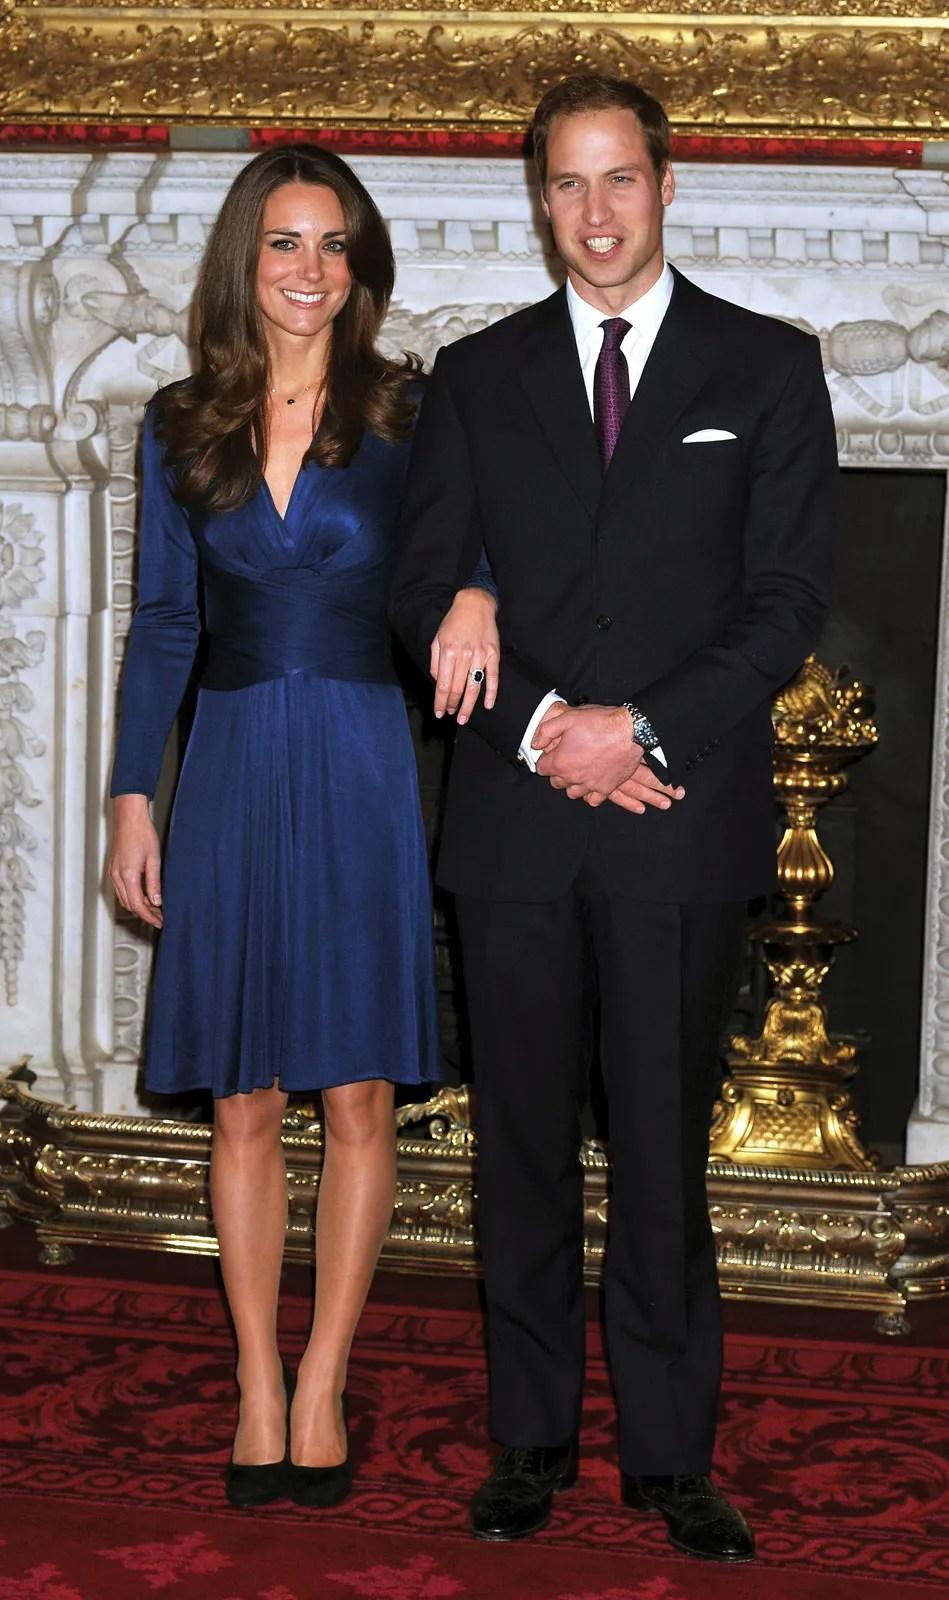 Kate Middleton Duchess Of Cambridge : middleton, duchess, cambridge, Catherine,, Duchess, Cambridge, Biography,, Children,, Family,, Facts, Britannica